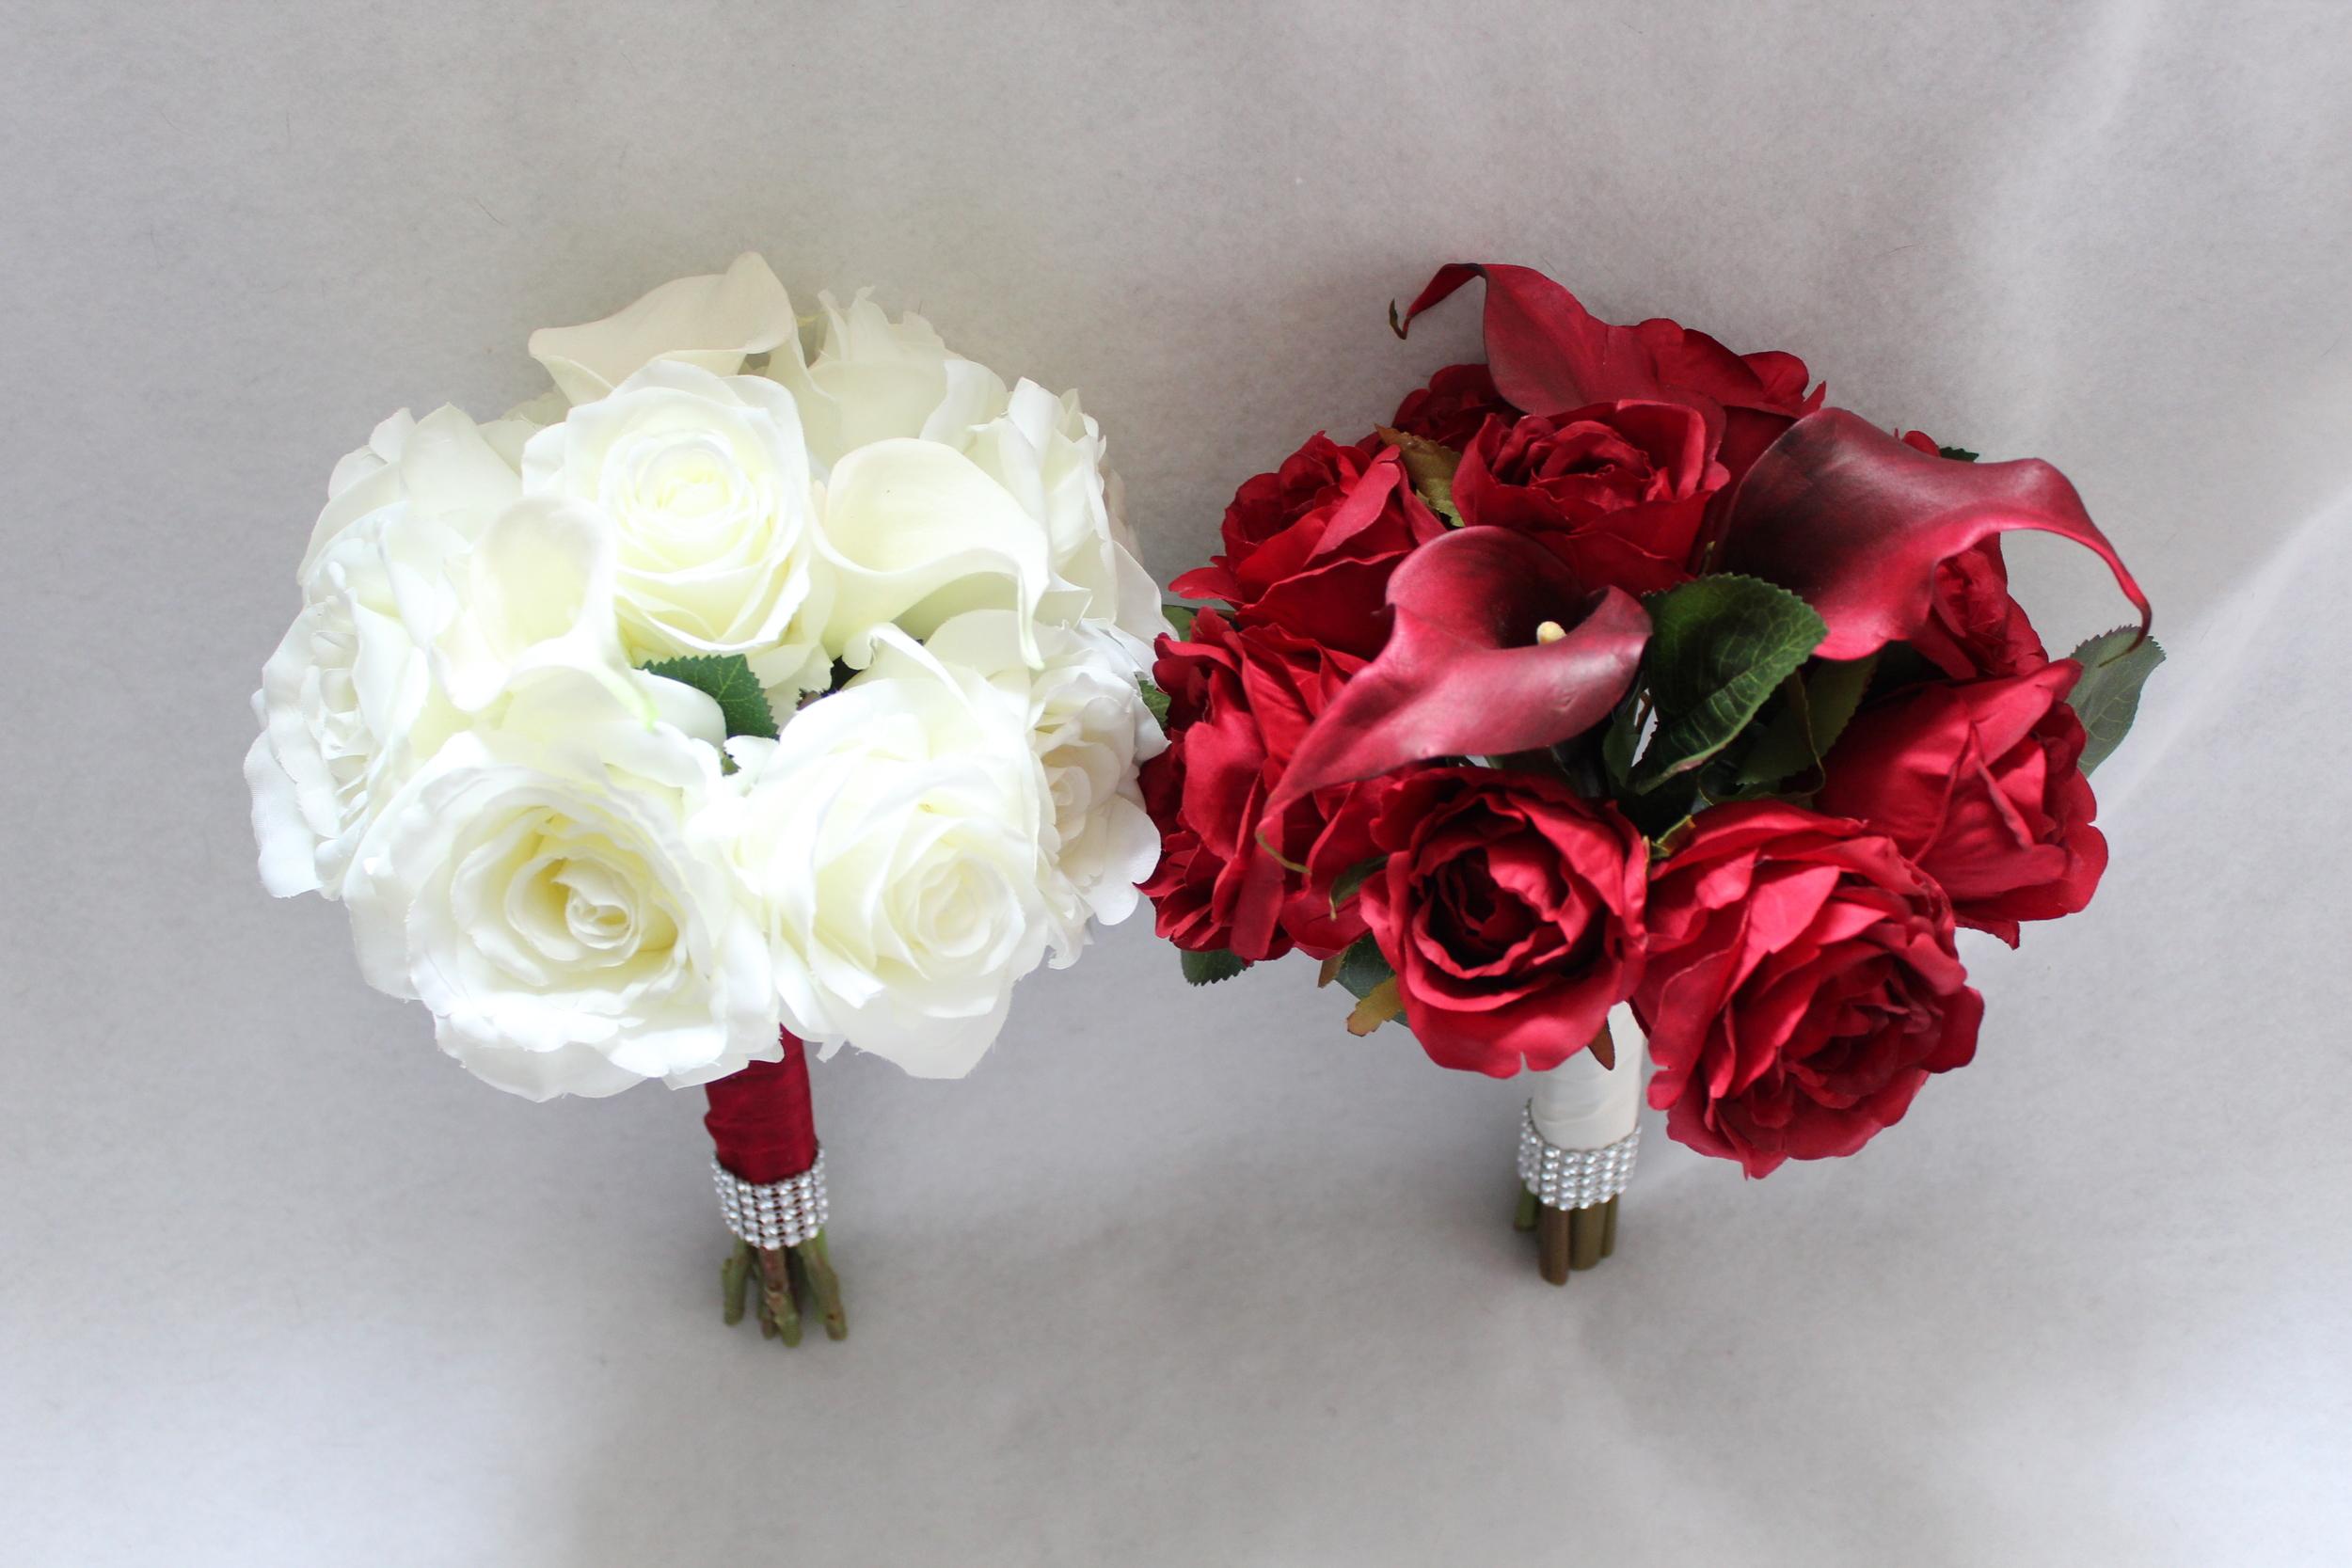 minneapolis-silk-florist-white-bouquet-and-red-bouquet-for-bridesmaids.jpg